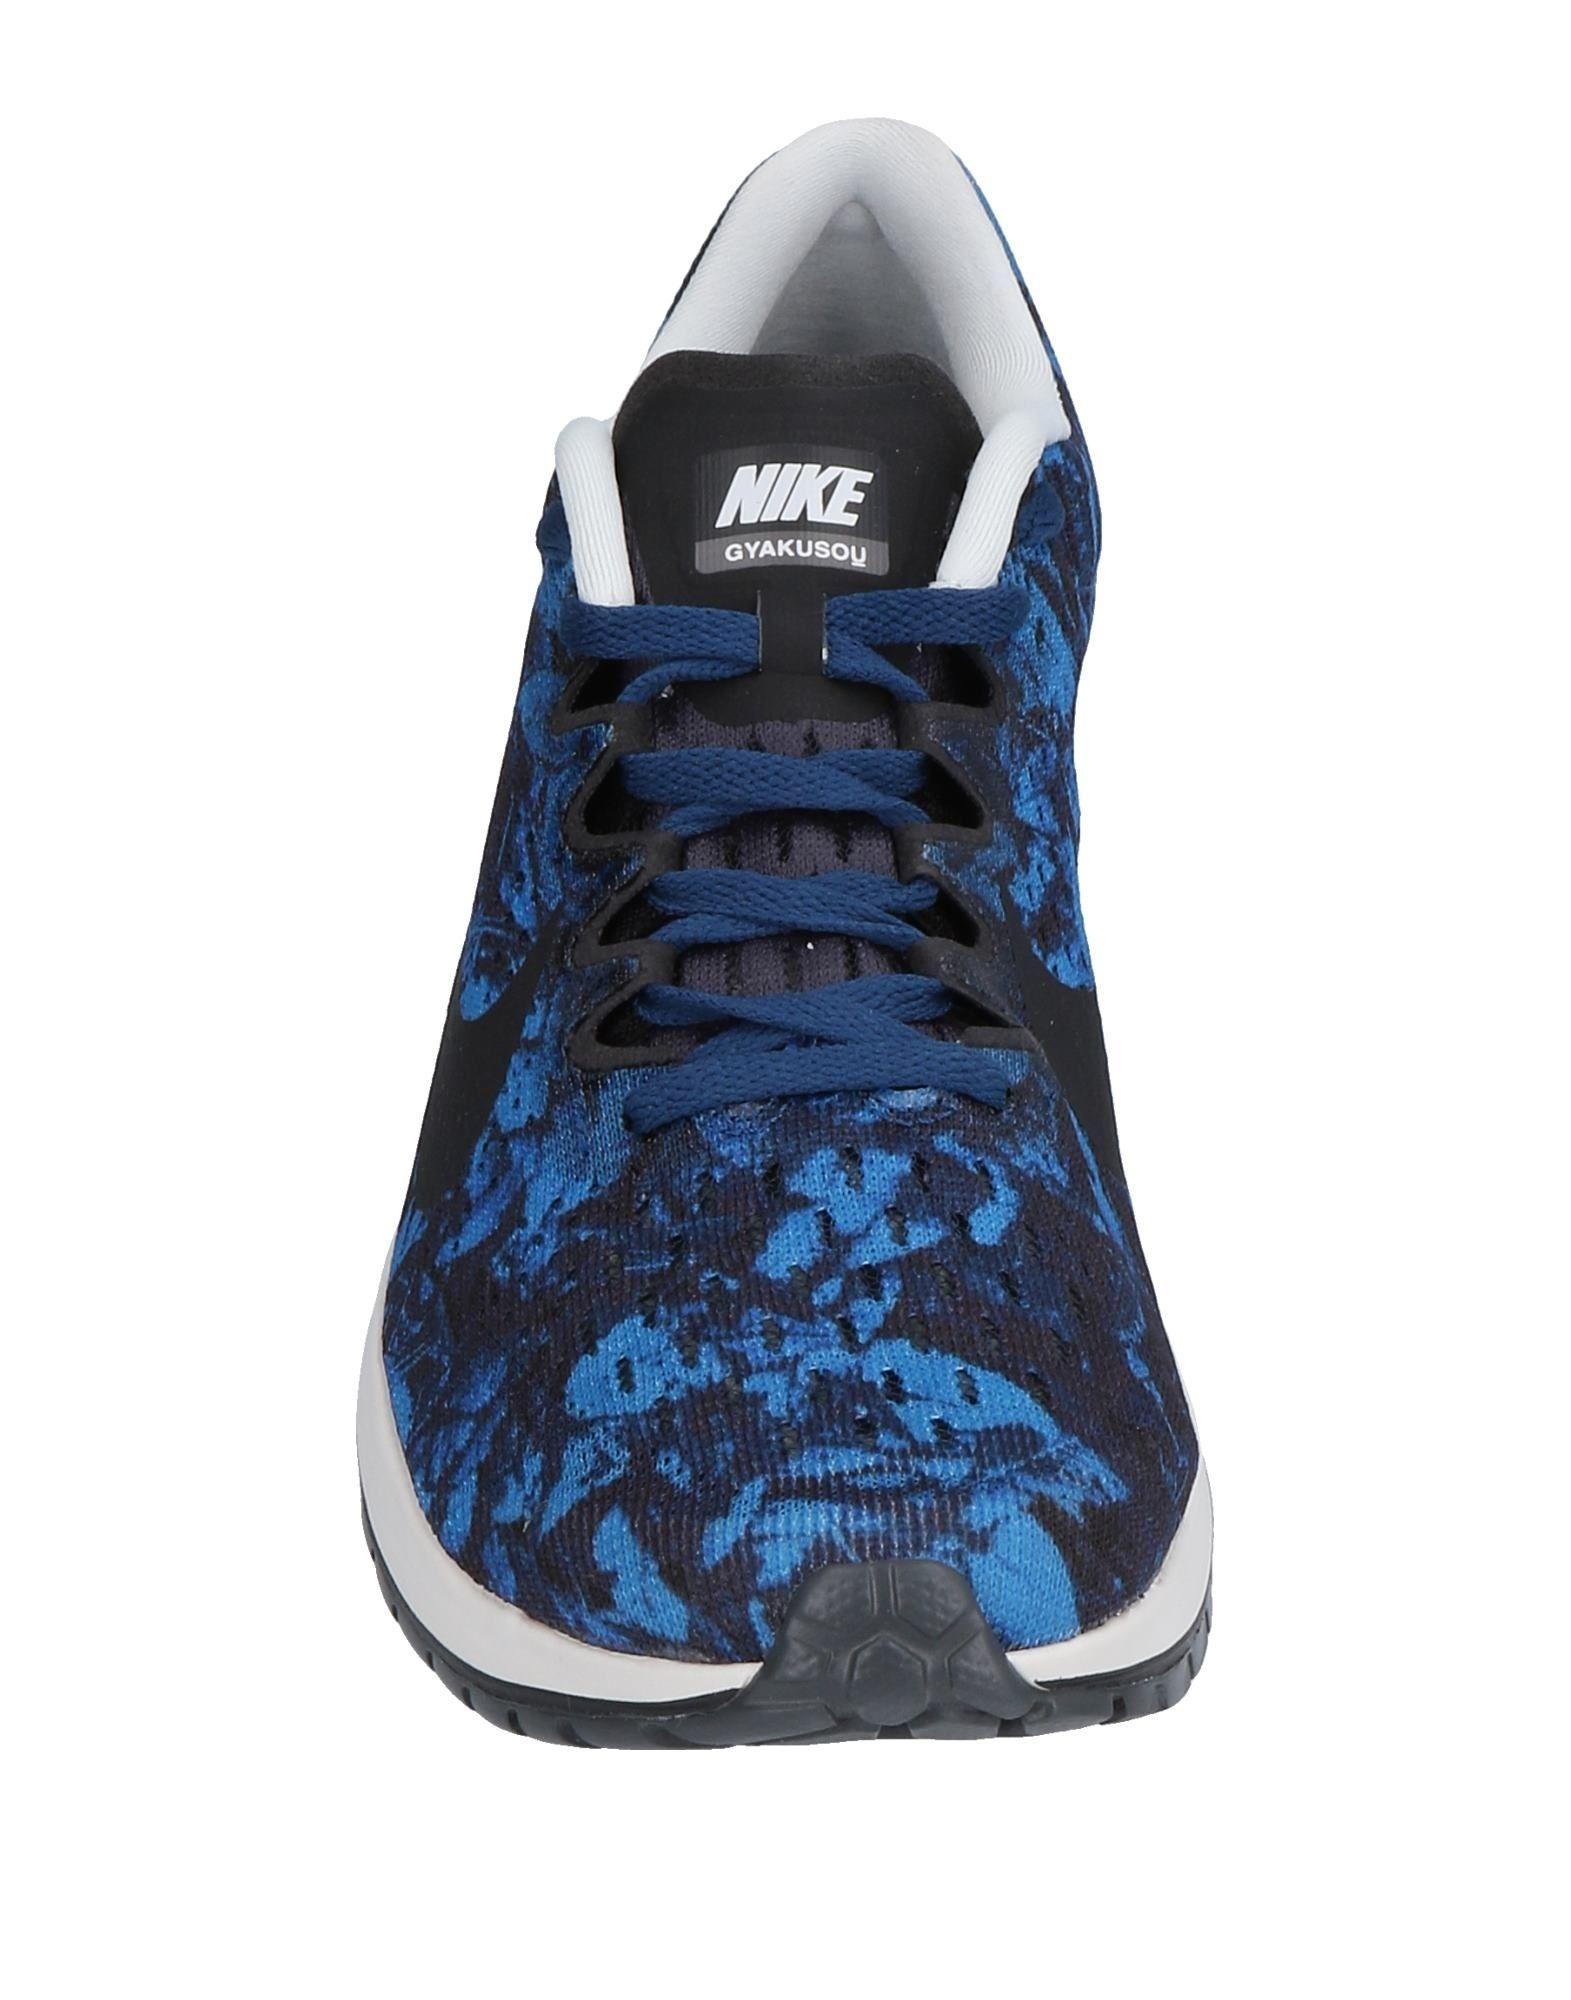 Rabatt Herren echte Schuhe Nike Sneakers Herren Rabatt  11520909JO 322e59